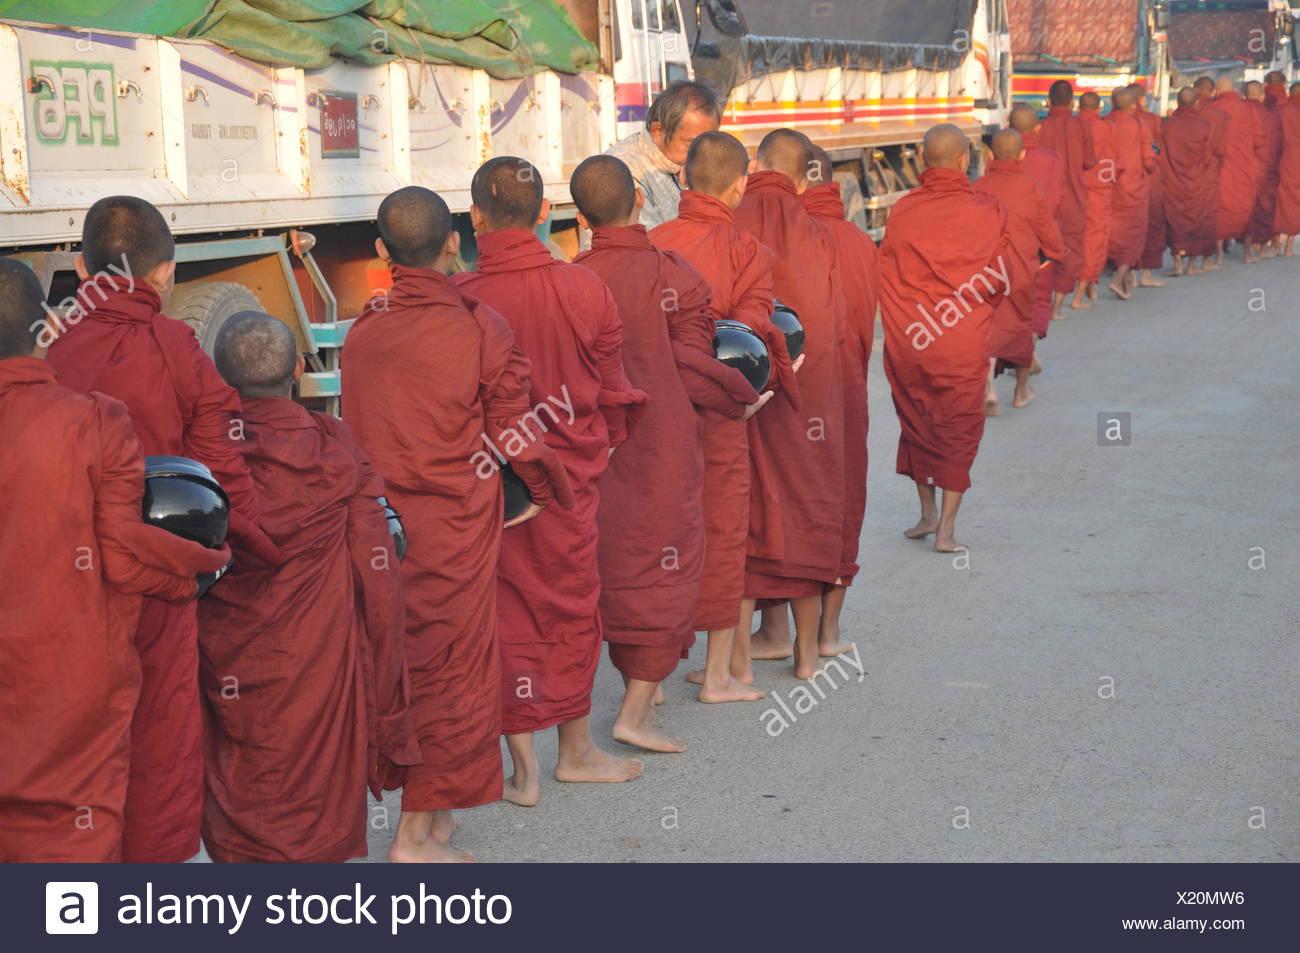 monk parade - Stock Image